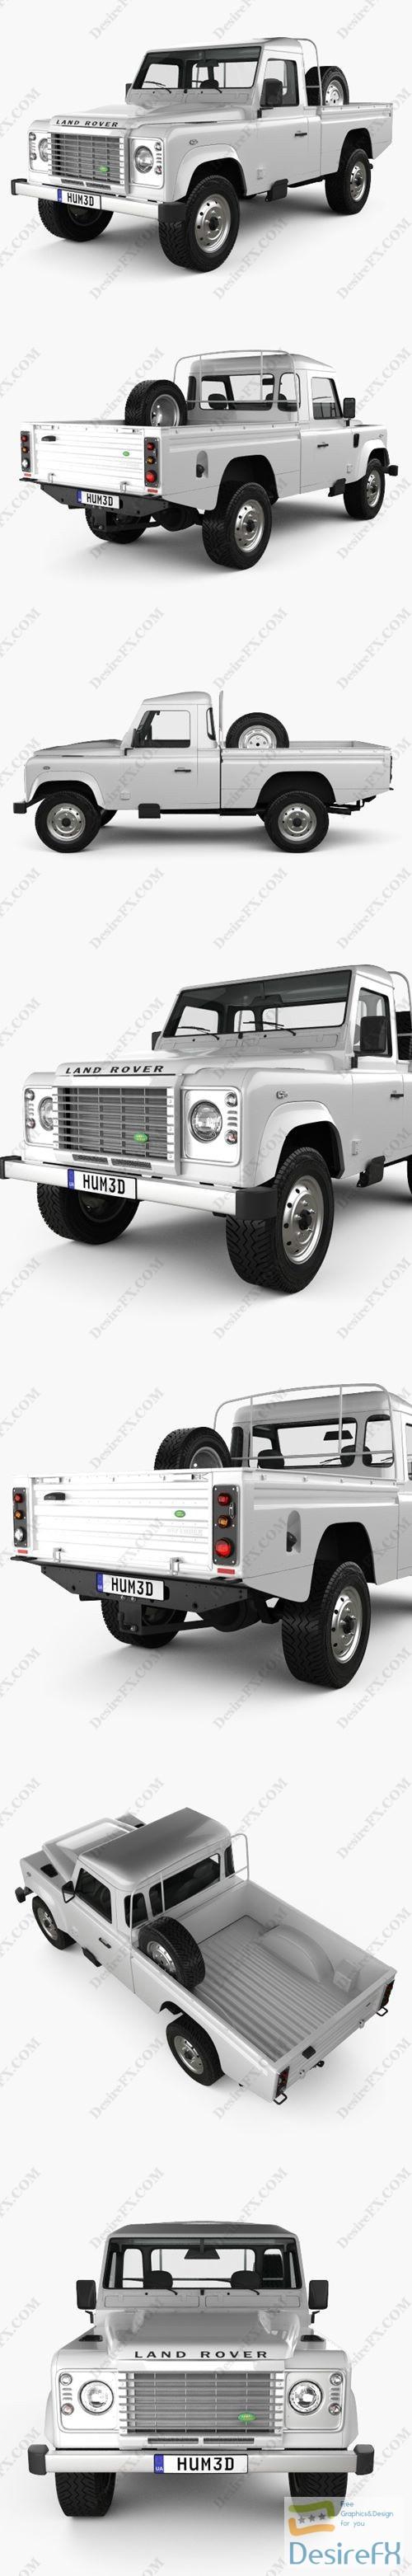 3d-models - Land Rover Defender 110 High Capacity PickUp 2011 3D Model